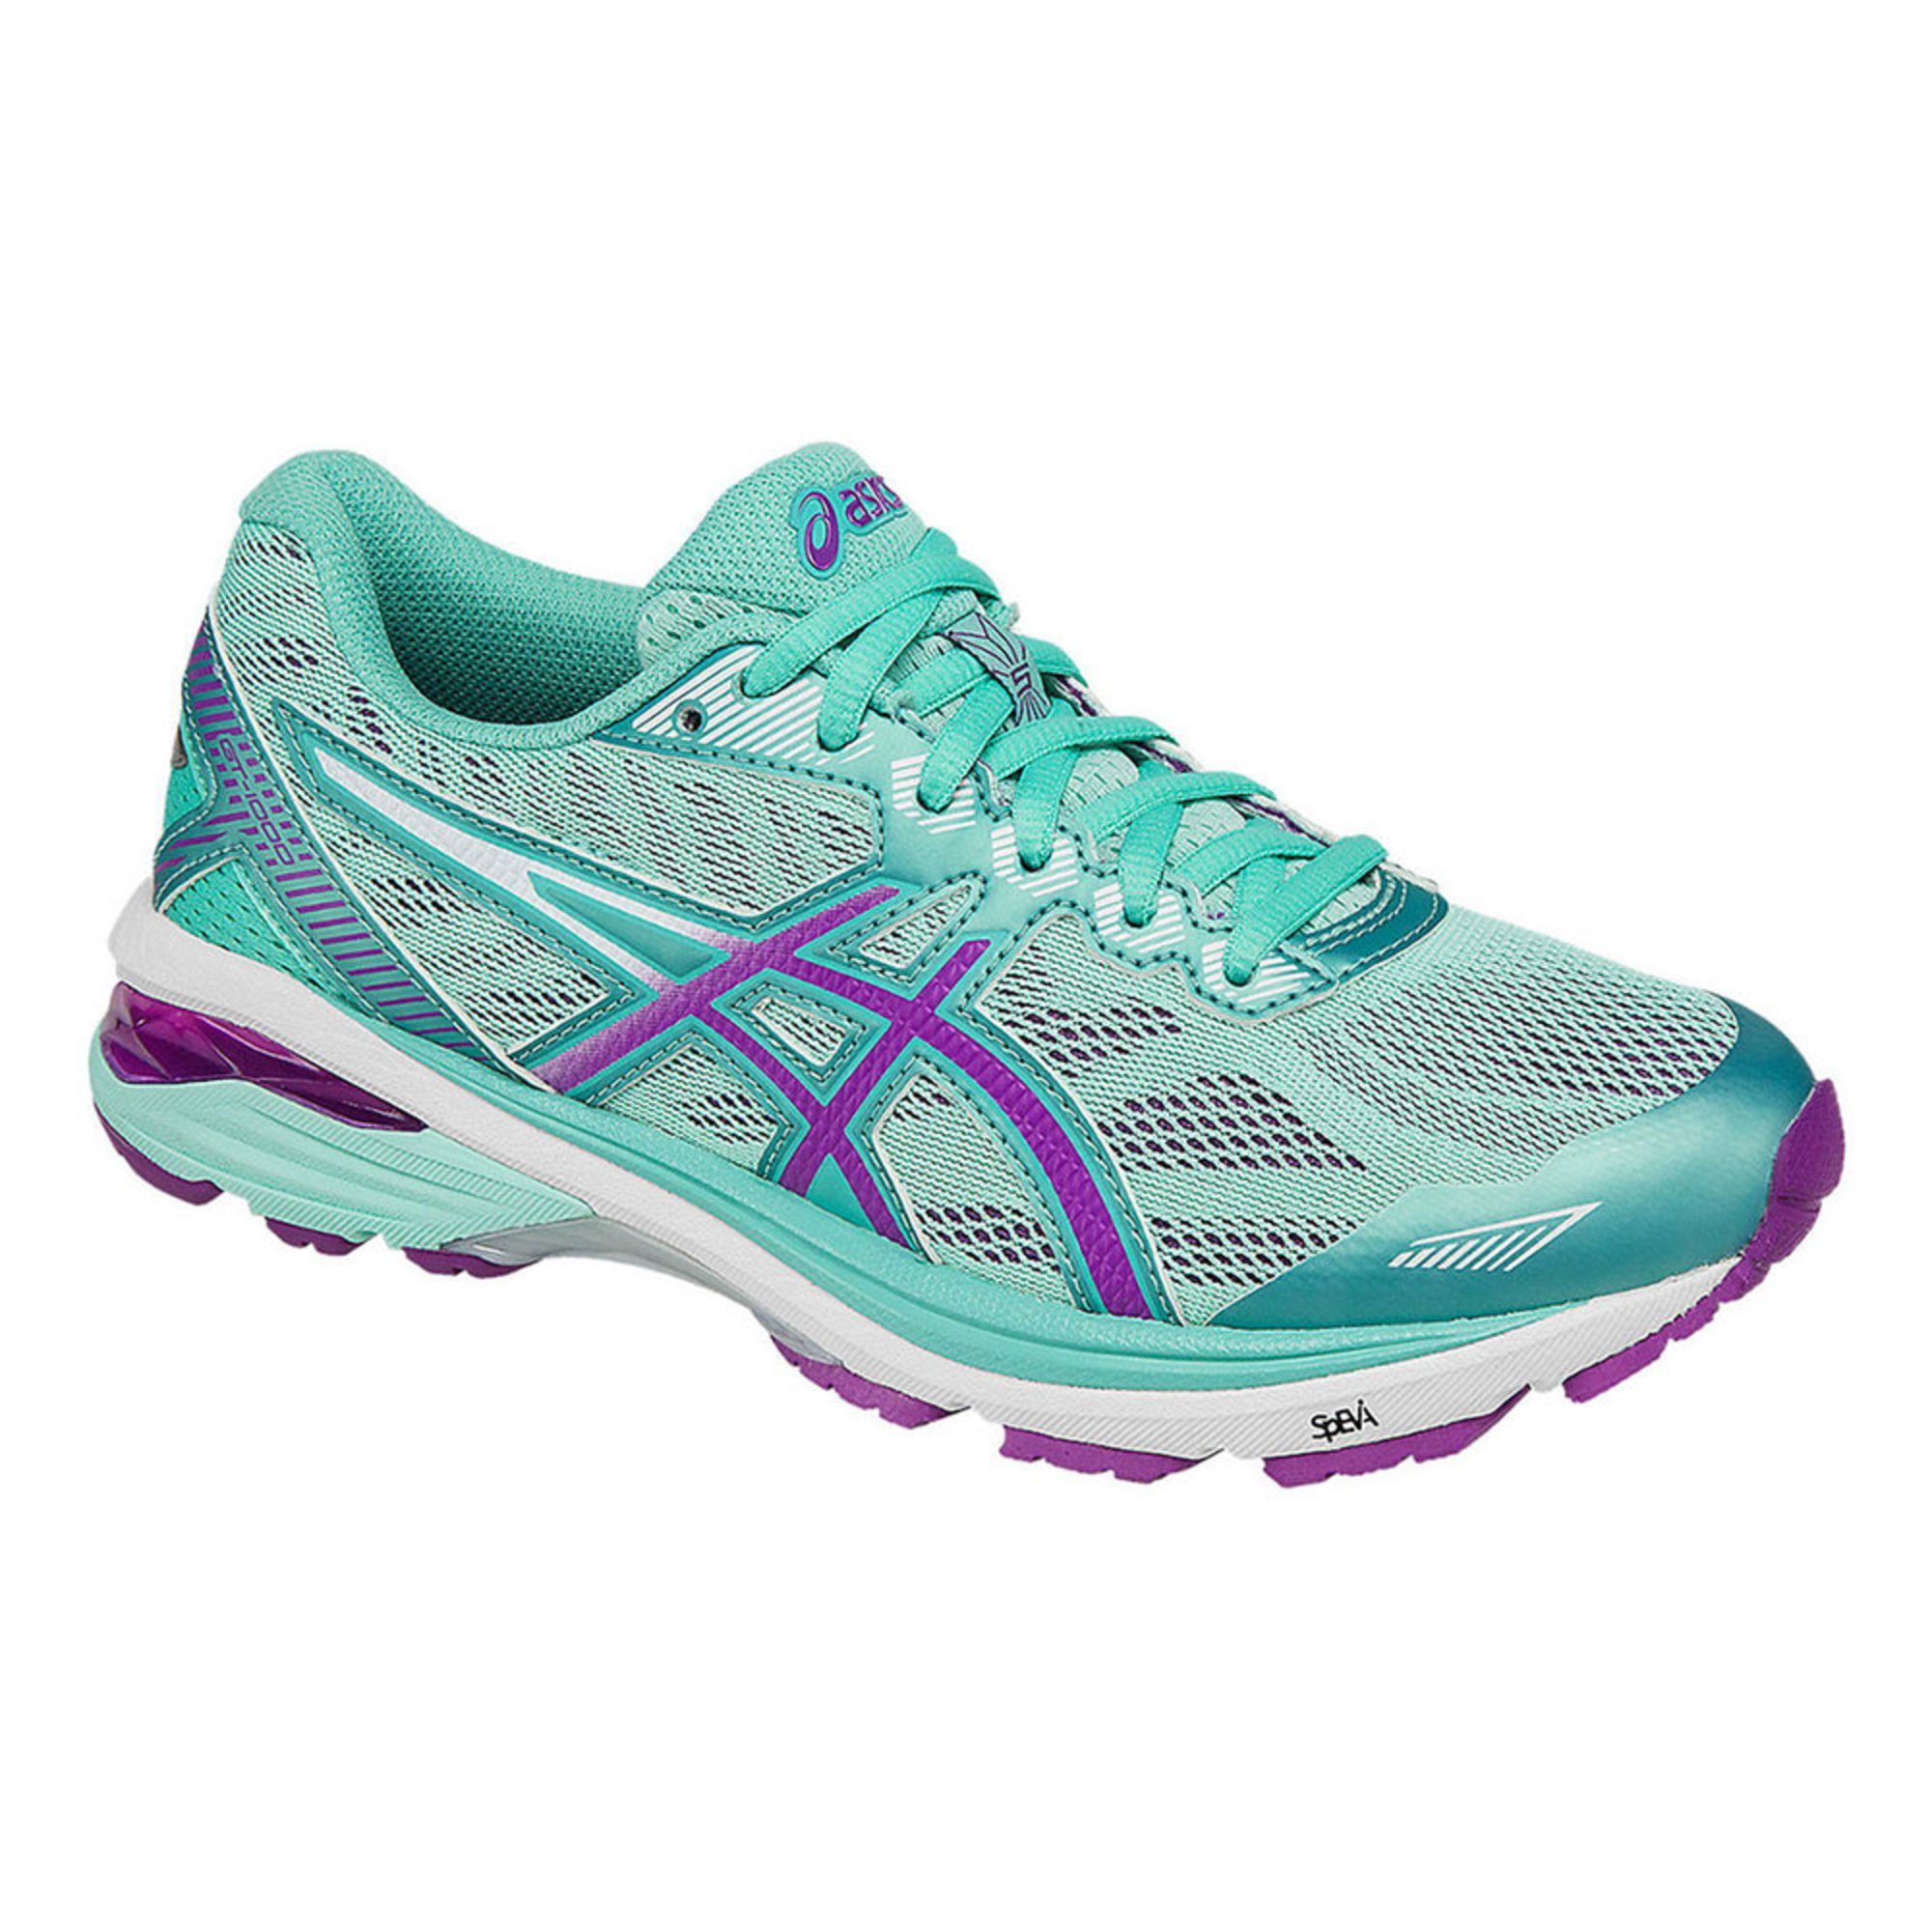 Asics. Asics GT-1000 5 Women's Running Shoe Mint / Orchid / Cockatoo